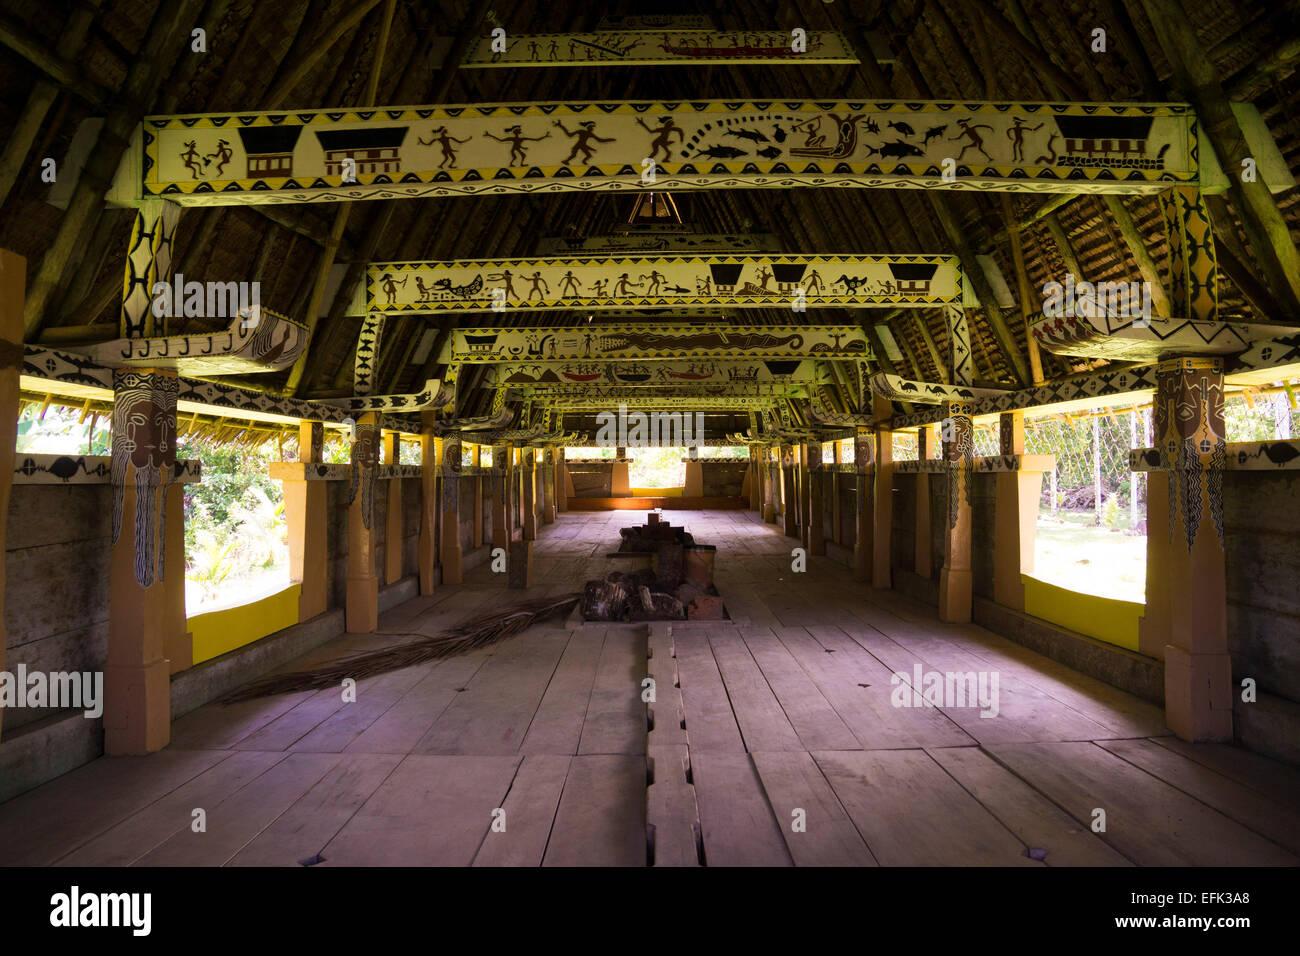 Interior of a traditional Bai of Palau, the men's house, Babeldaob, Palau, Oceania - Stock Image